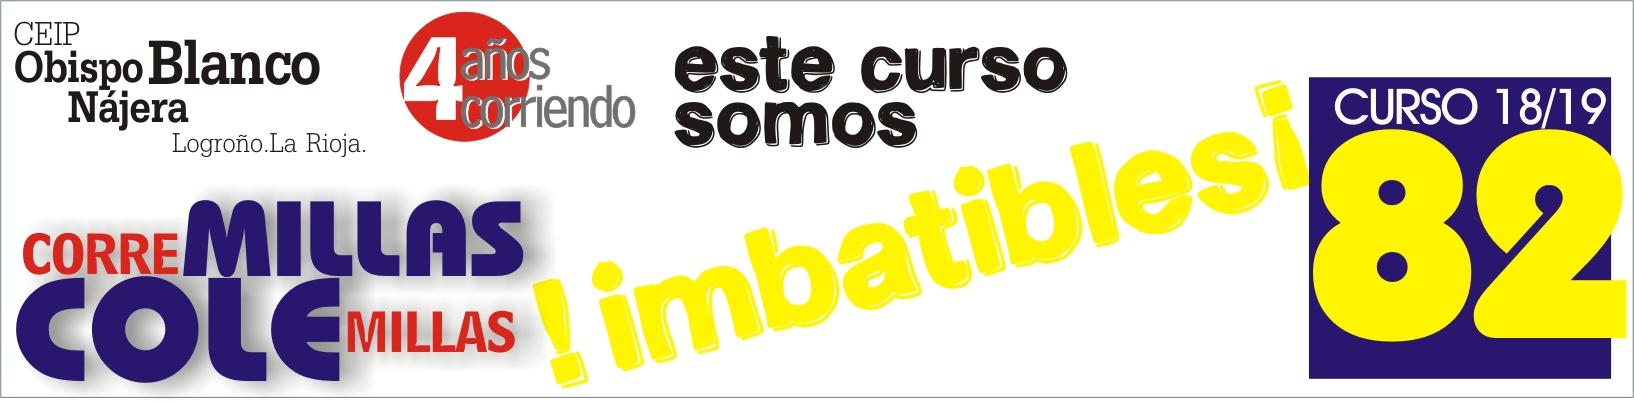 imbatibles1